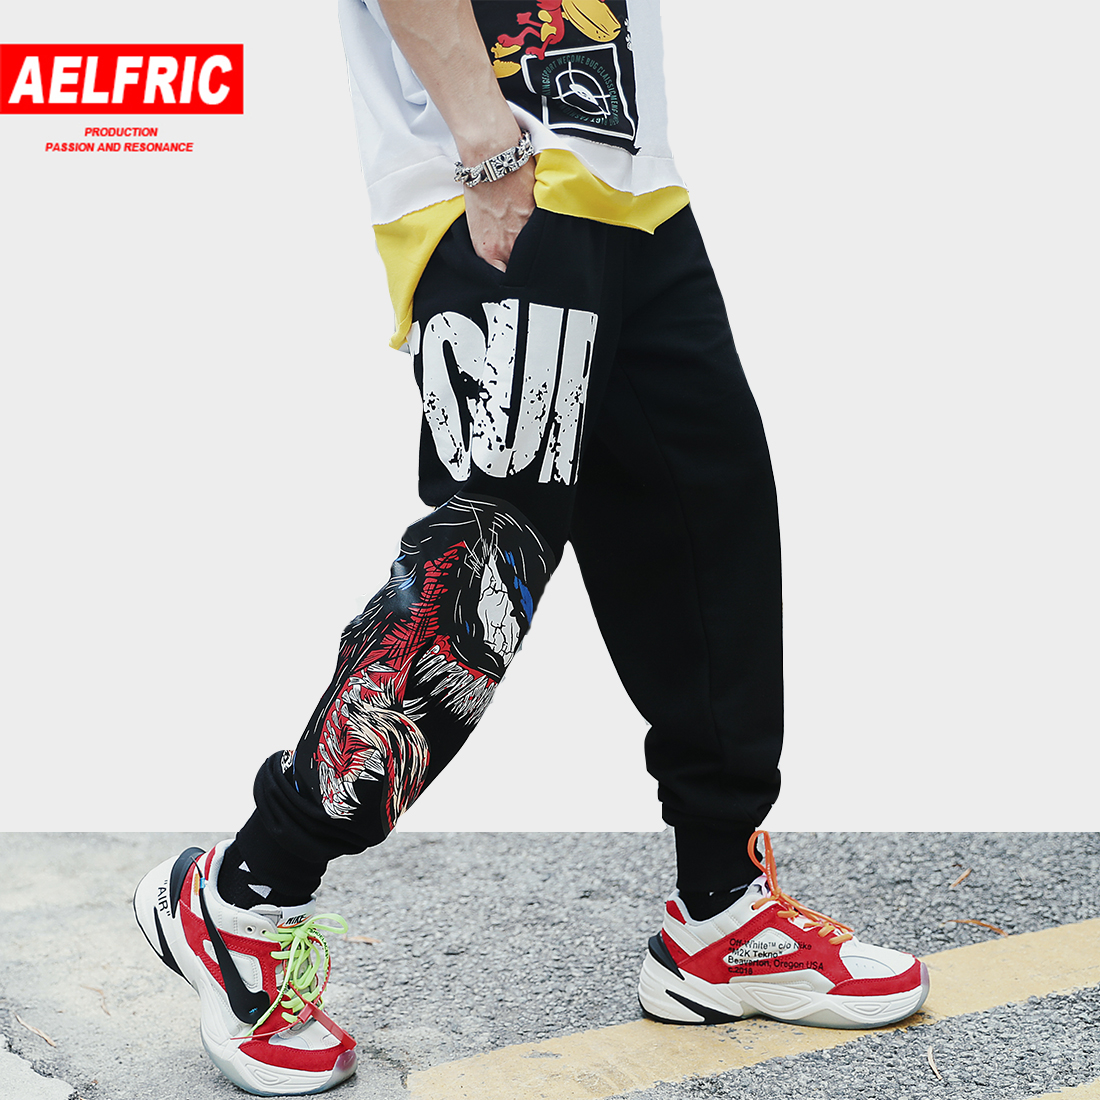 Aelfric Casual Pants Man 2019 Spring New Arrival Animal 3d Print Fashion Joggers Harajuku Streetwear Hip Hop Black Sweatpants